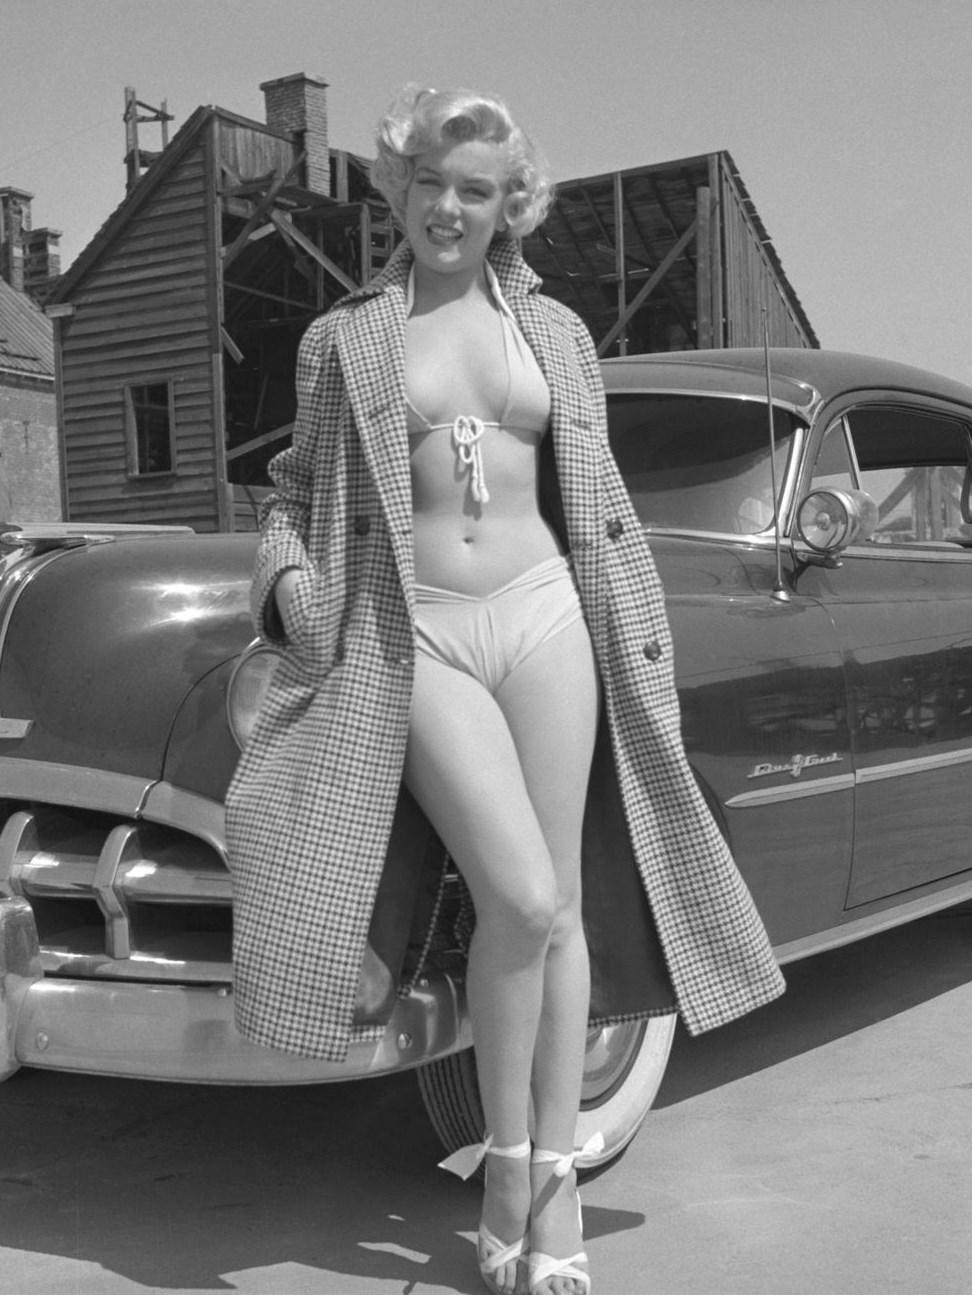 Marilyn-Monroe-image-marilyn-monroe-36726197-972-1295